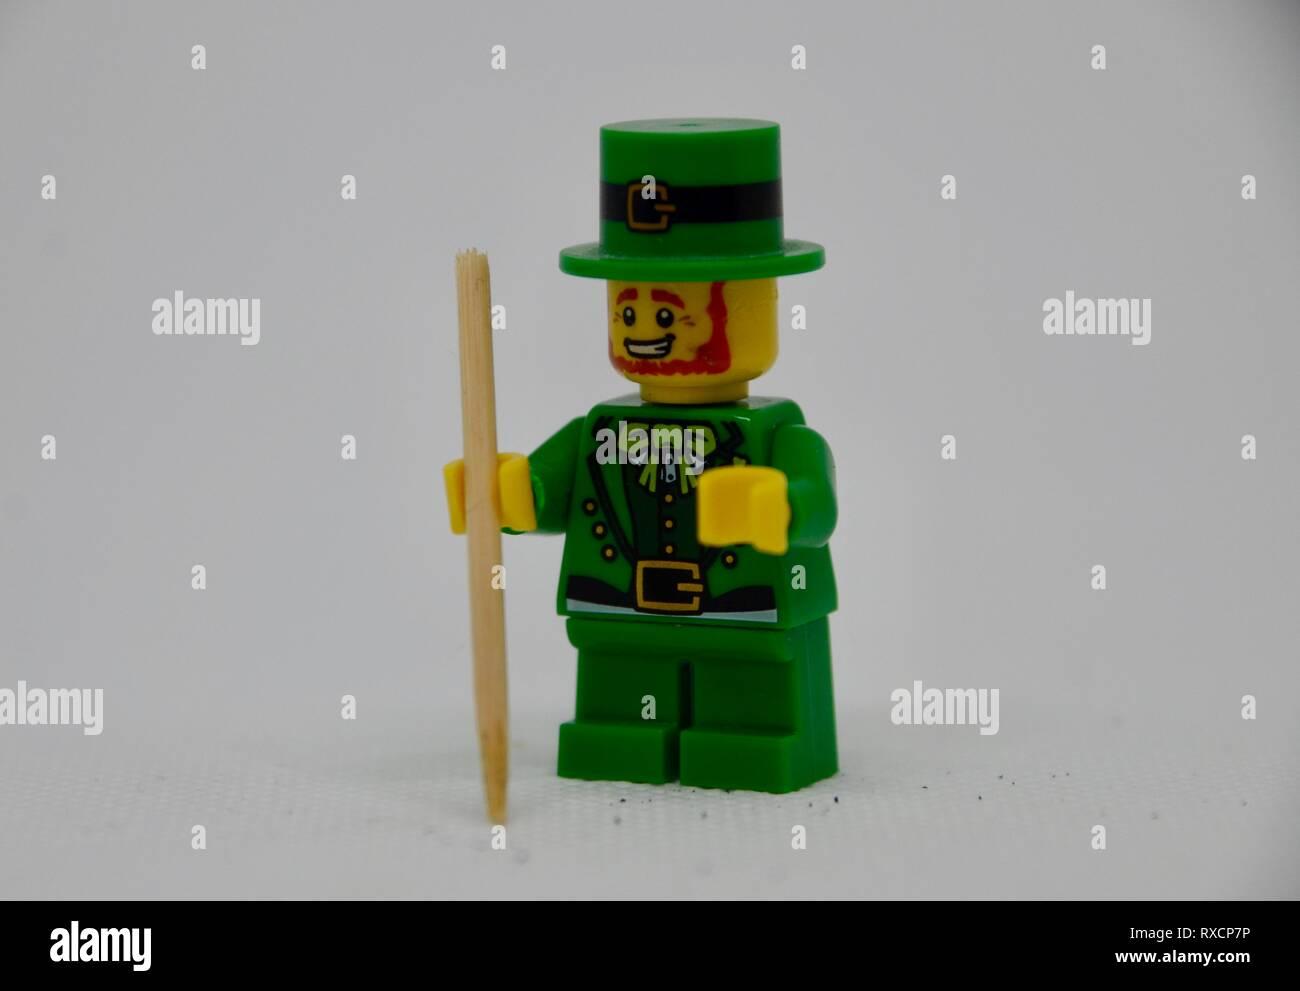 leprechaun mini lego figure - Stock Image